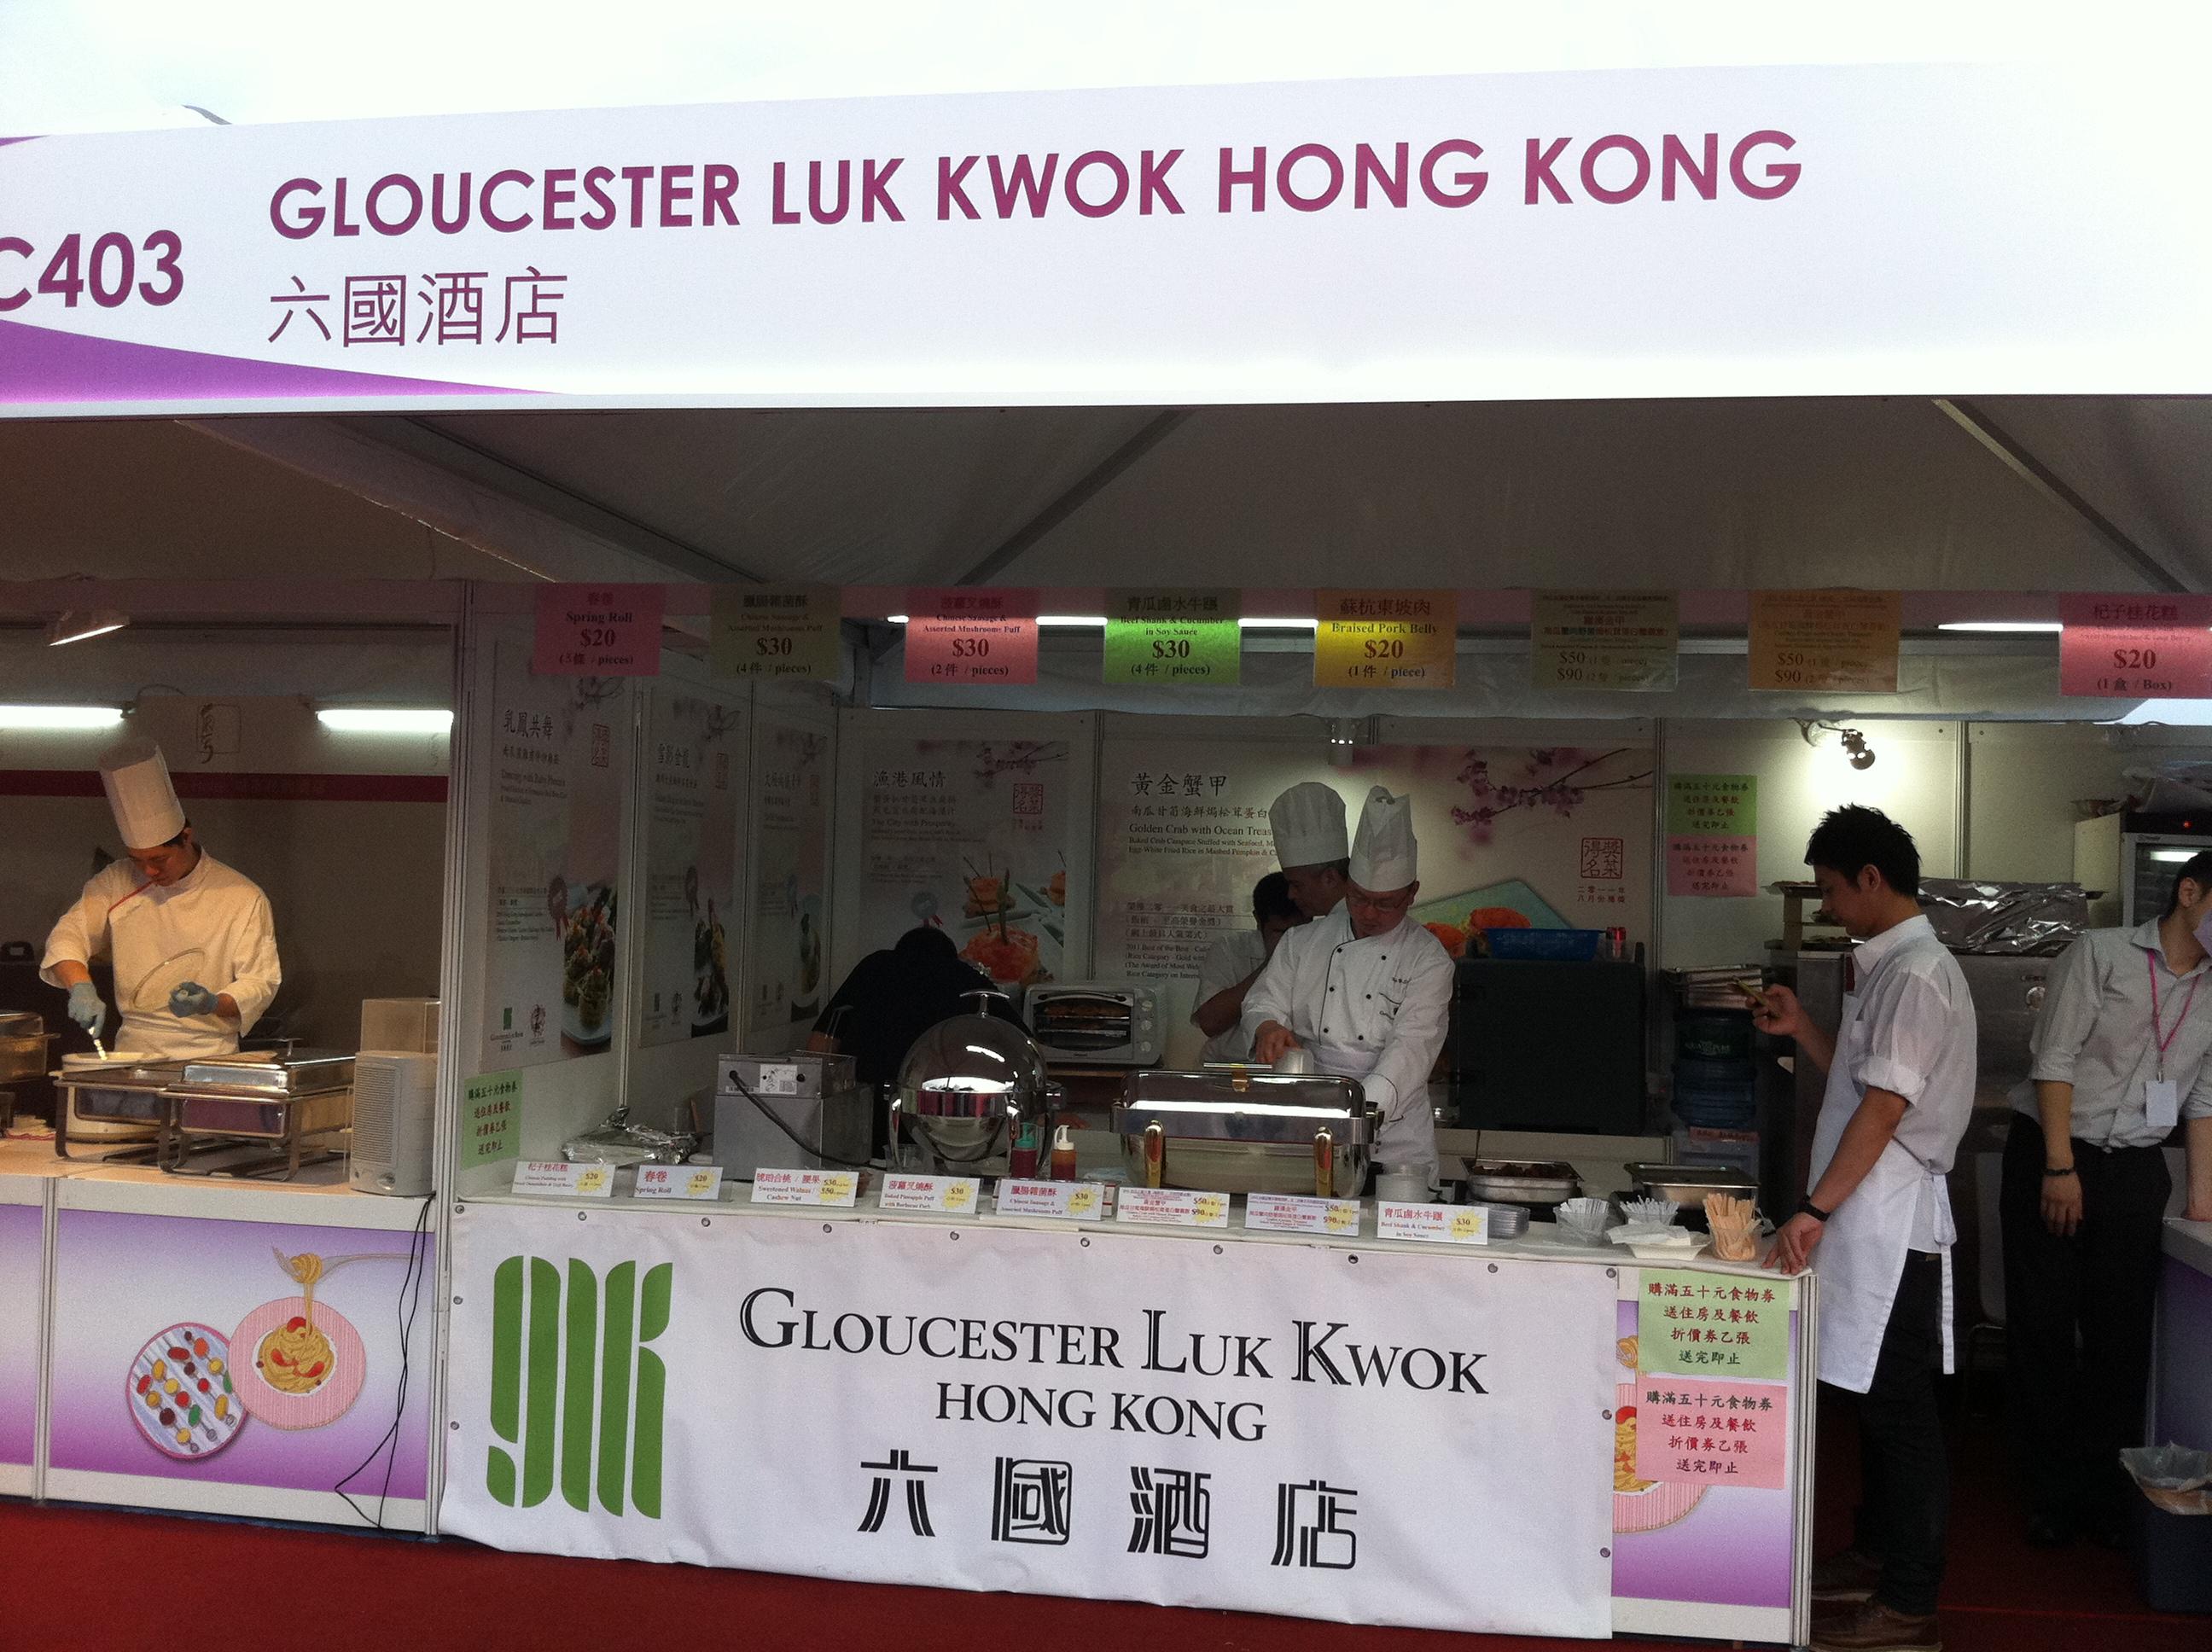 Hong Kong Wine And Food Festival